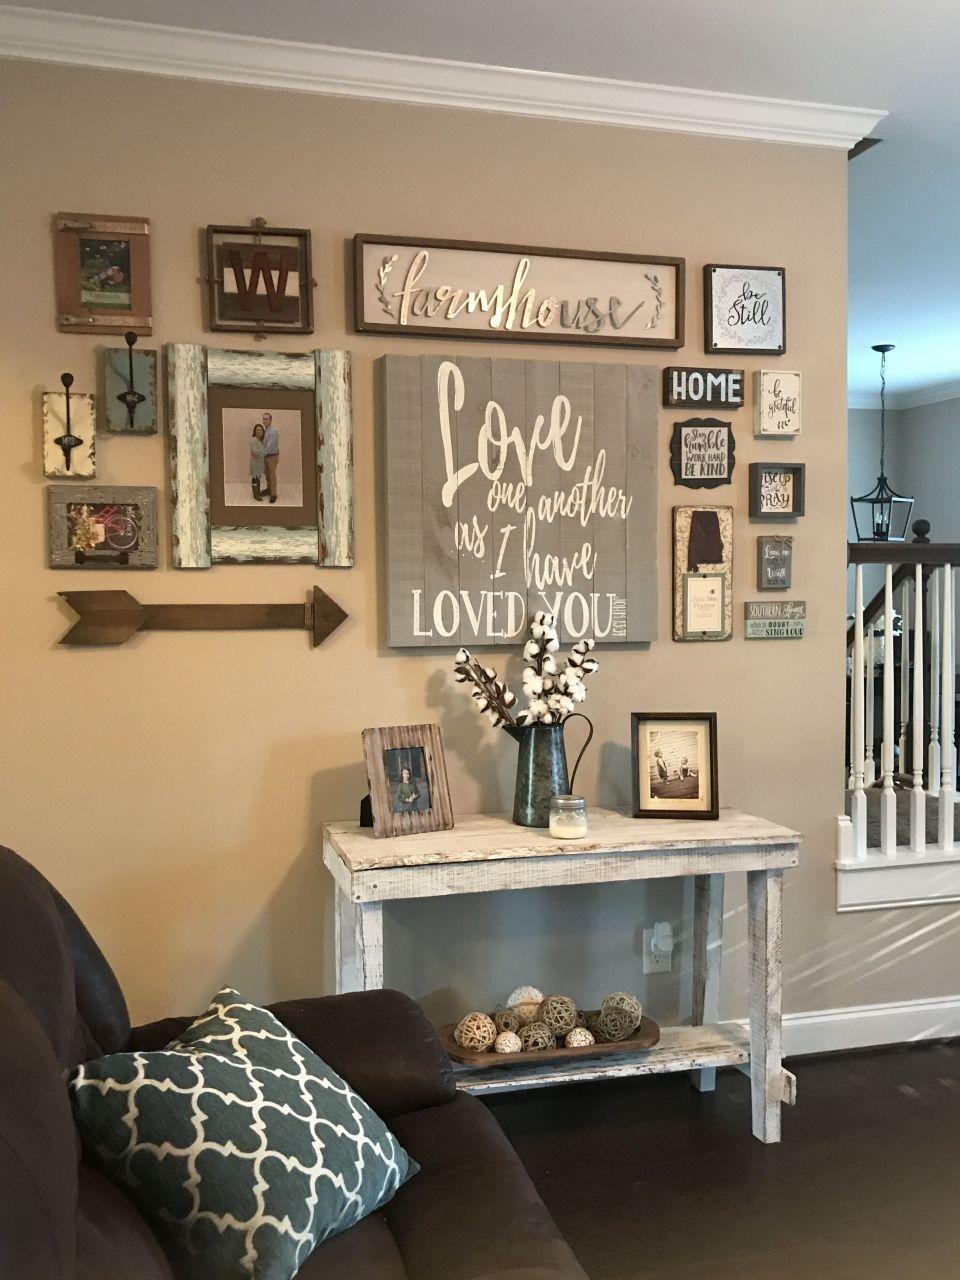 26 Best Joanna Gaines Inspired Diy Ideas Ceplukan Room Wall Decor Wall Decor Living Room Farmhouse Wall Decor